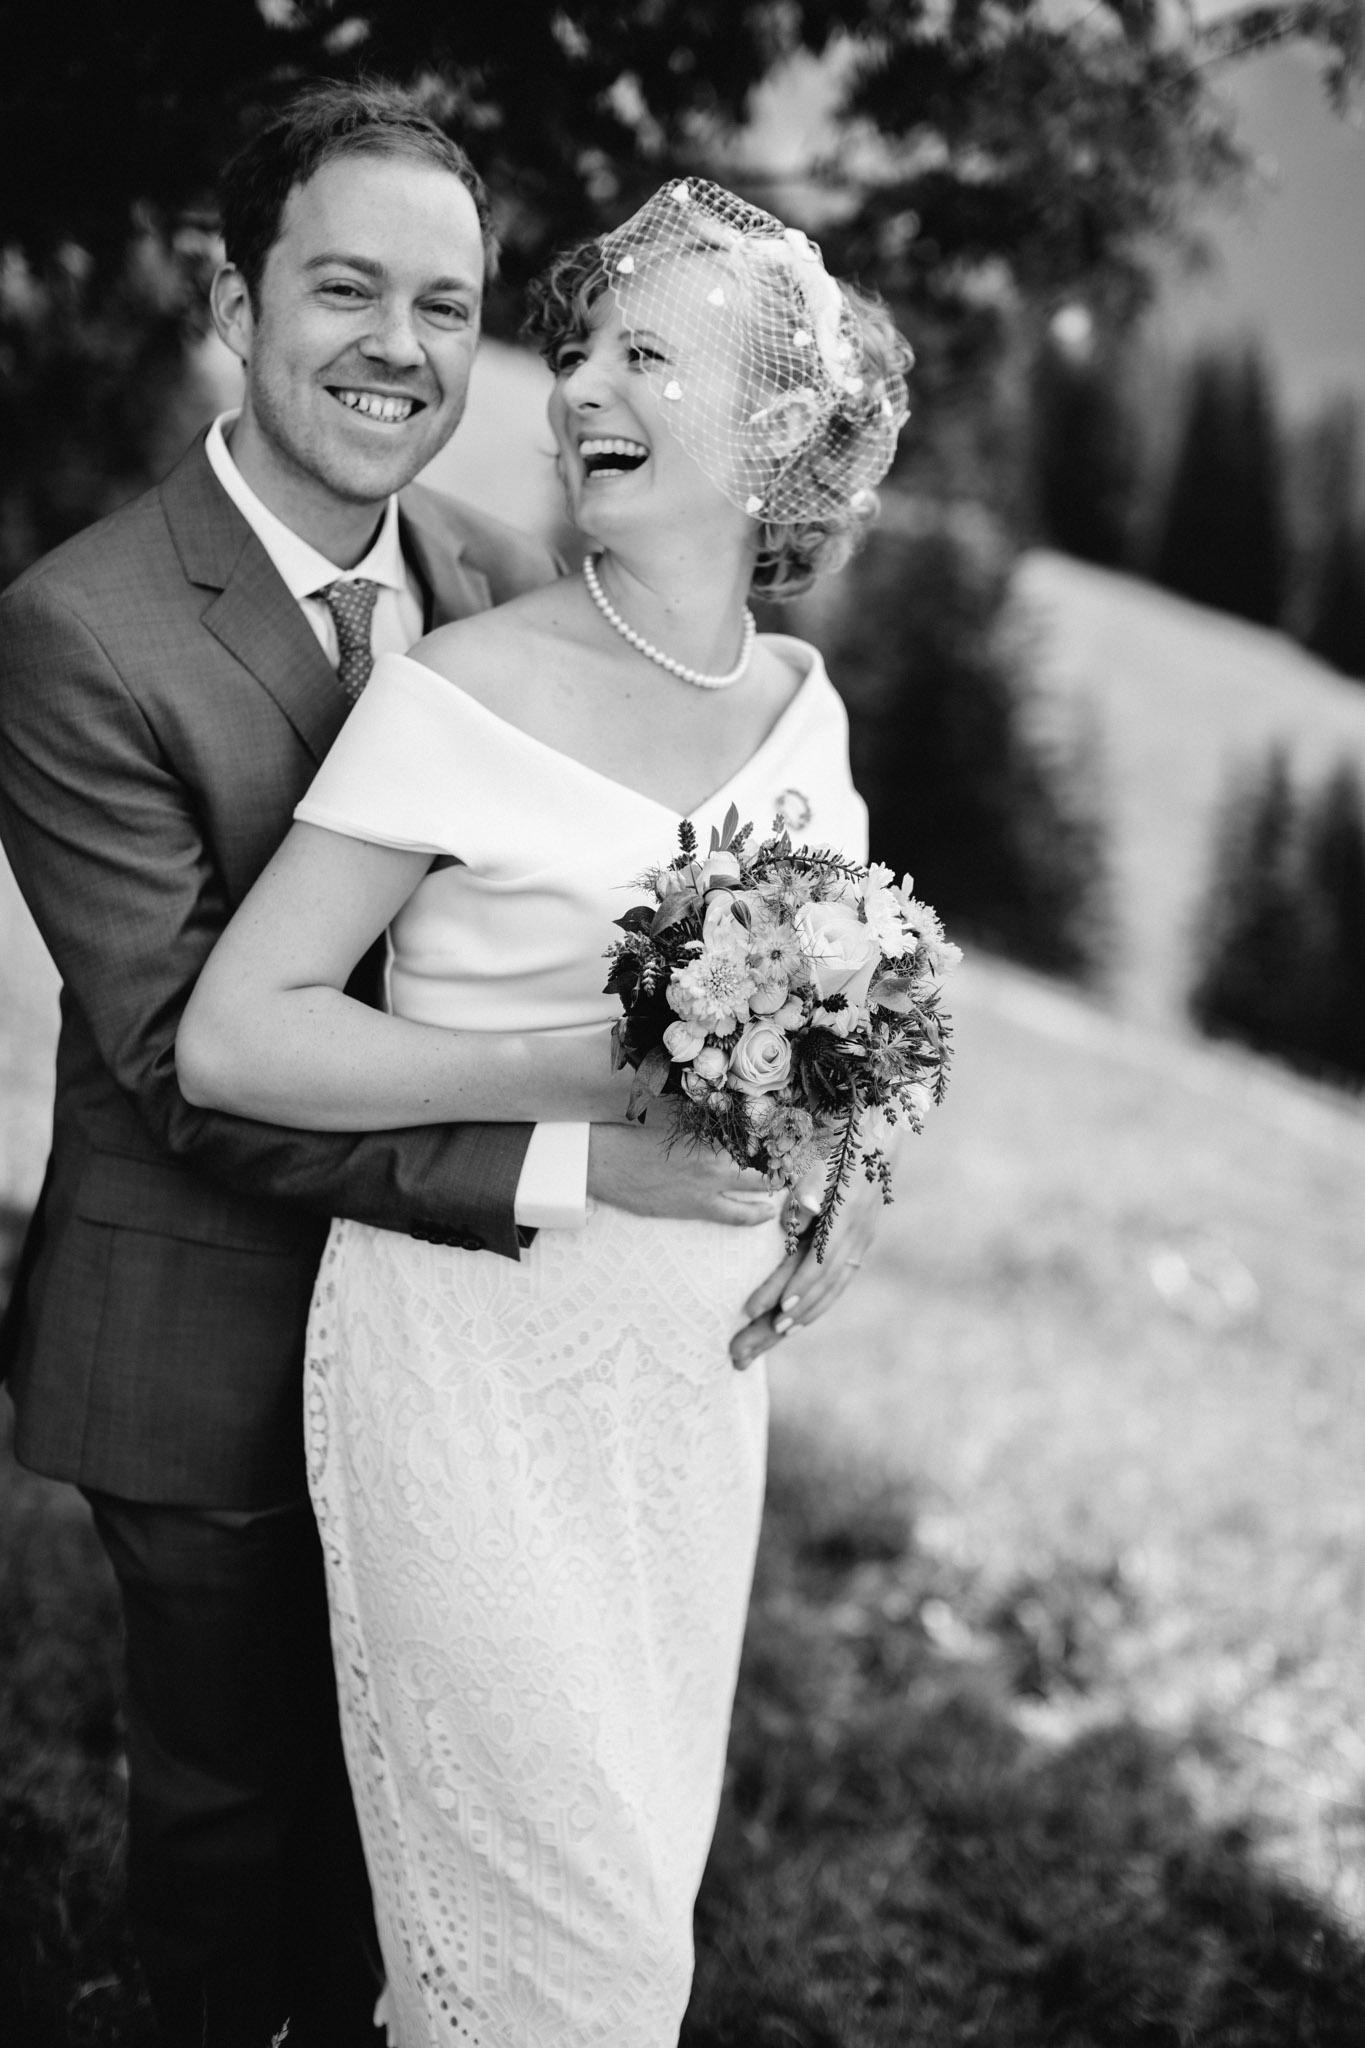 Lenl-Simmental-Buehlerhof-Pia-Anna-Christian-Wedding-Photography-EK-39.jpg